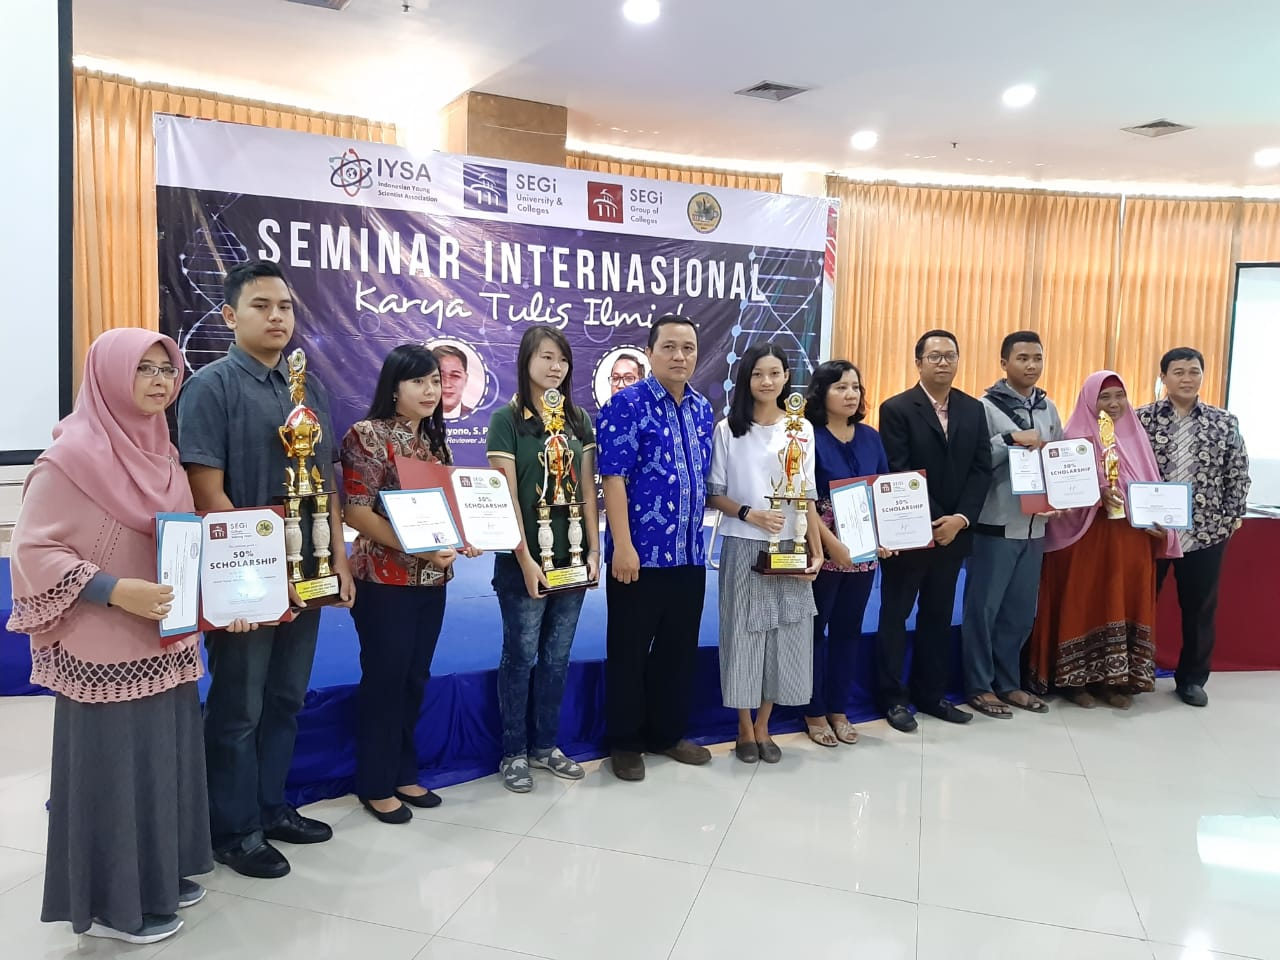 Seminar Internasional Karya Tulis Ilmiah Bersama SEGi University, MGMP Biologi Jawa Timur dan Pendidikan.id